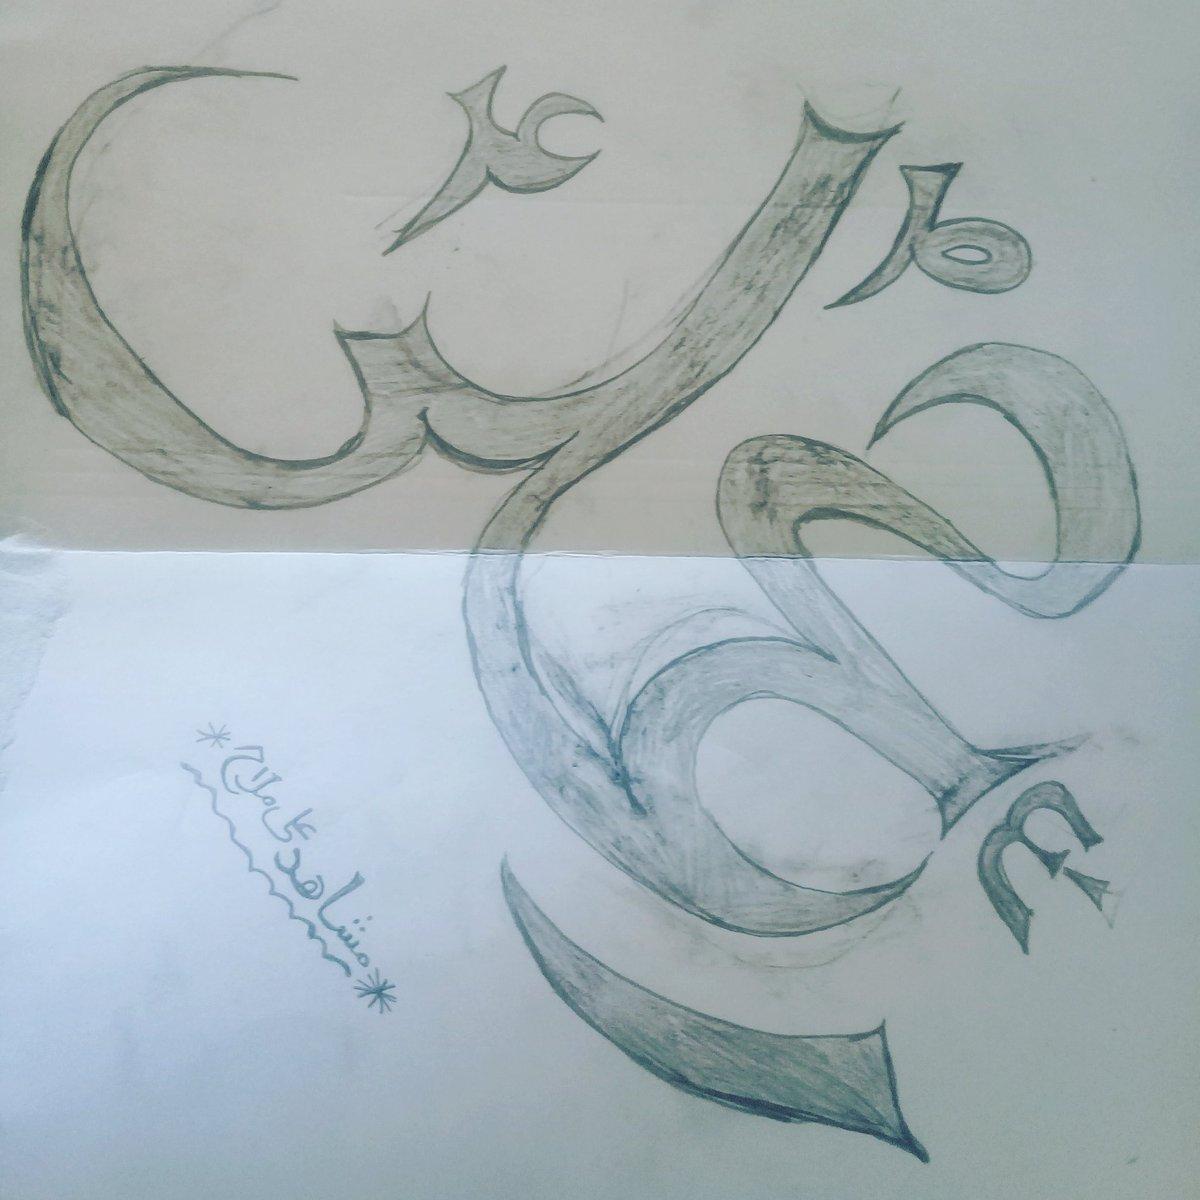 #ArtistOnTwitter #sketch  #sketchbook  #Calligraphy  #LikeForLikes  #follorwtrick  #picoftheday  #photography